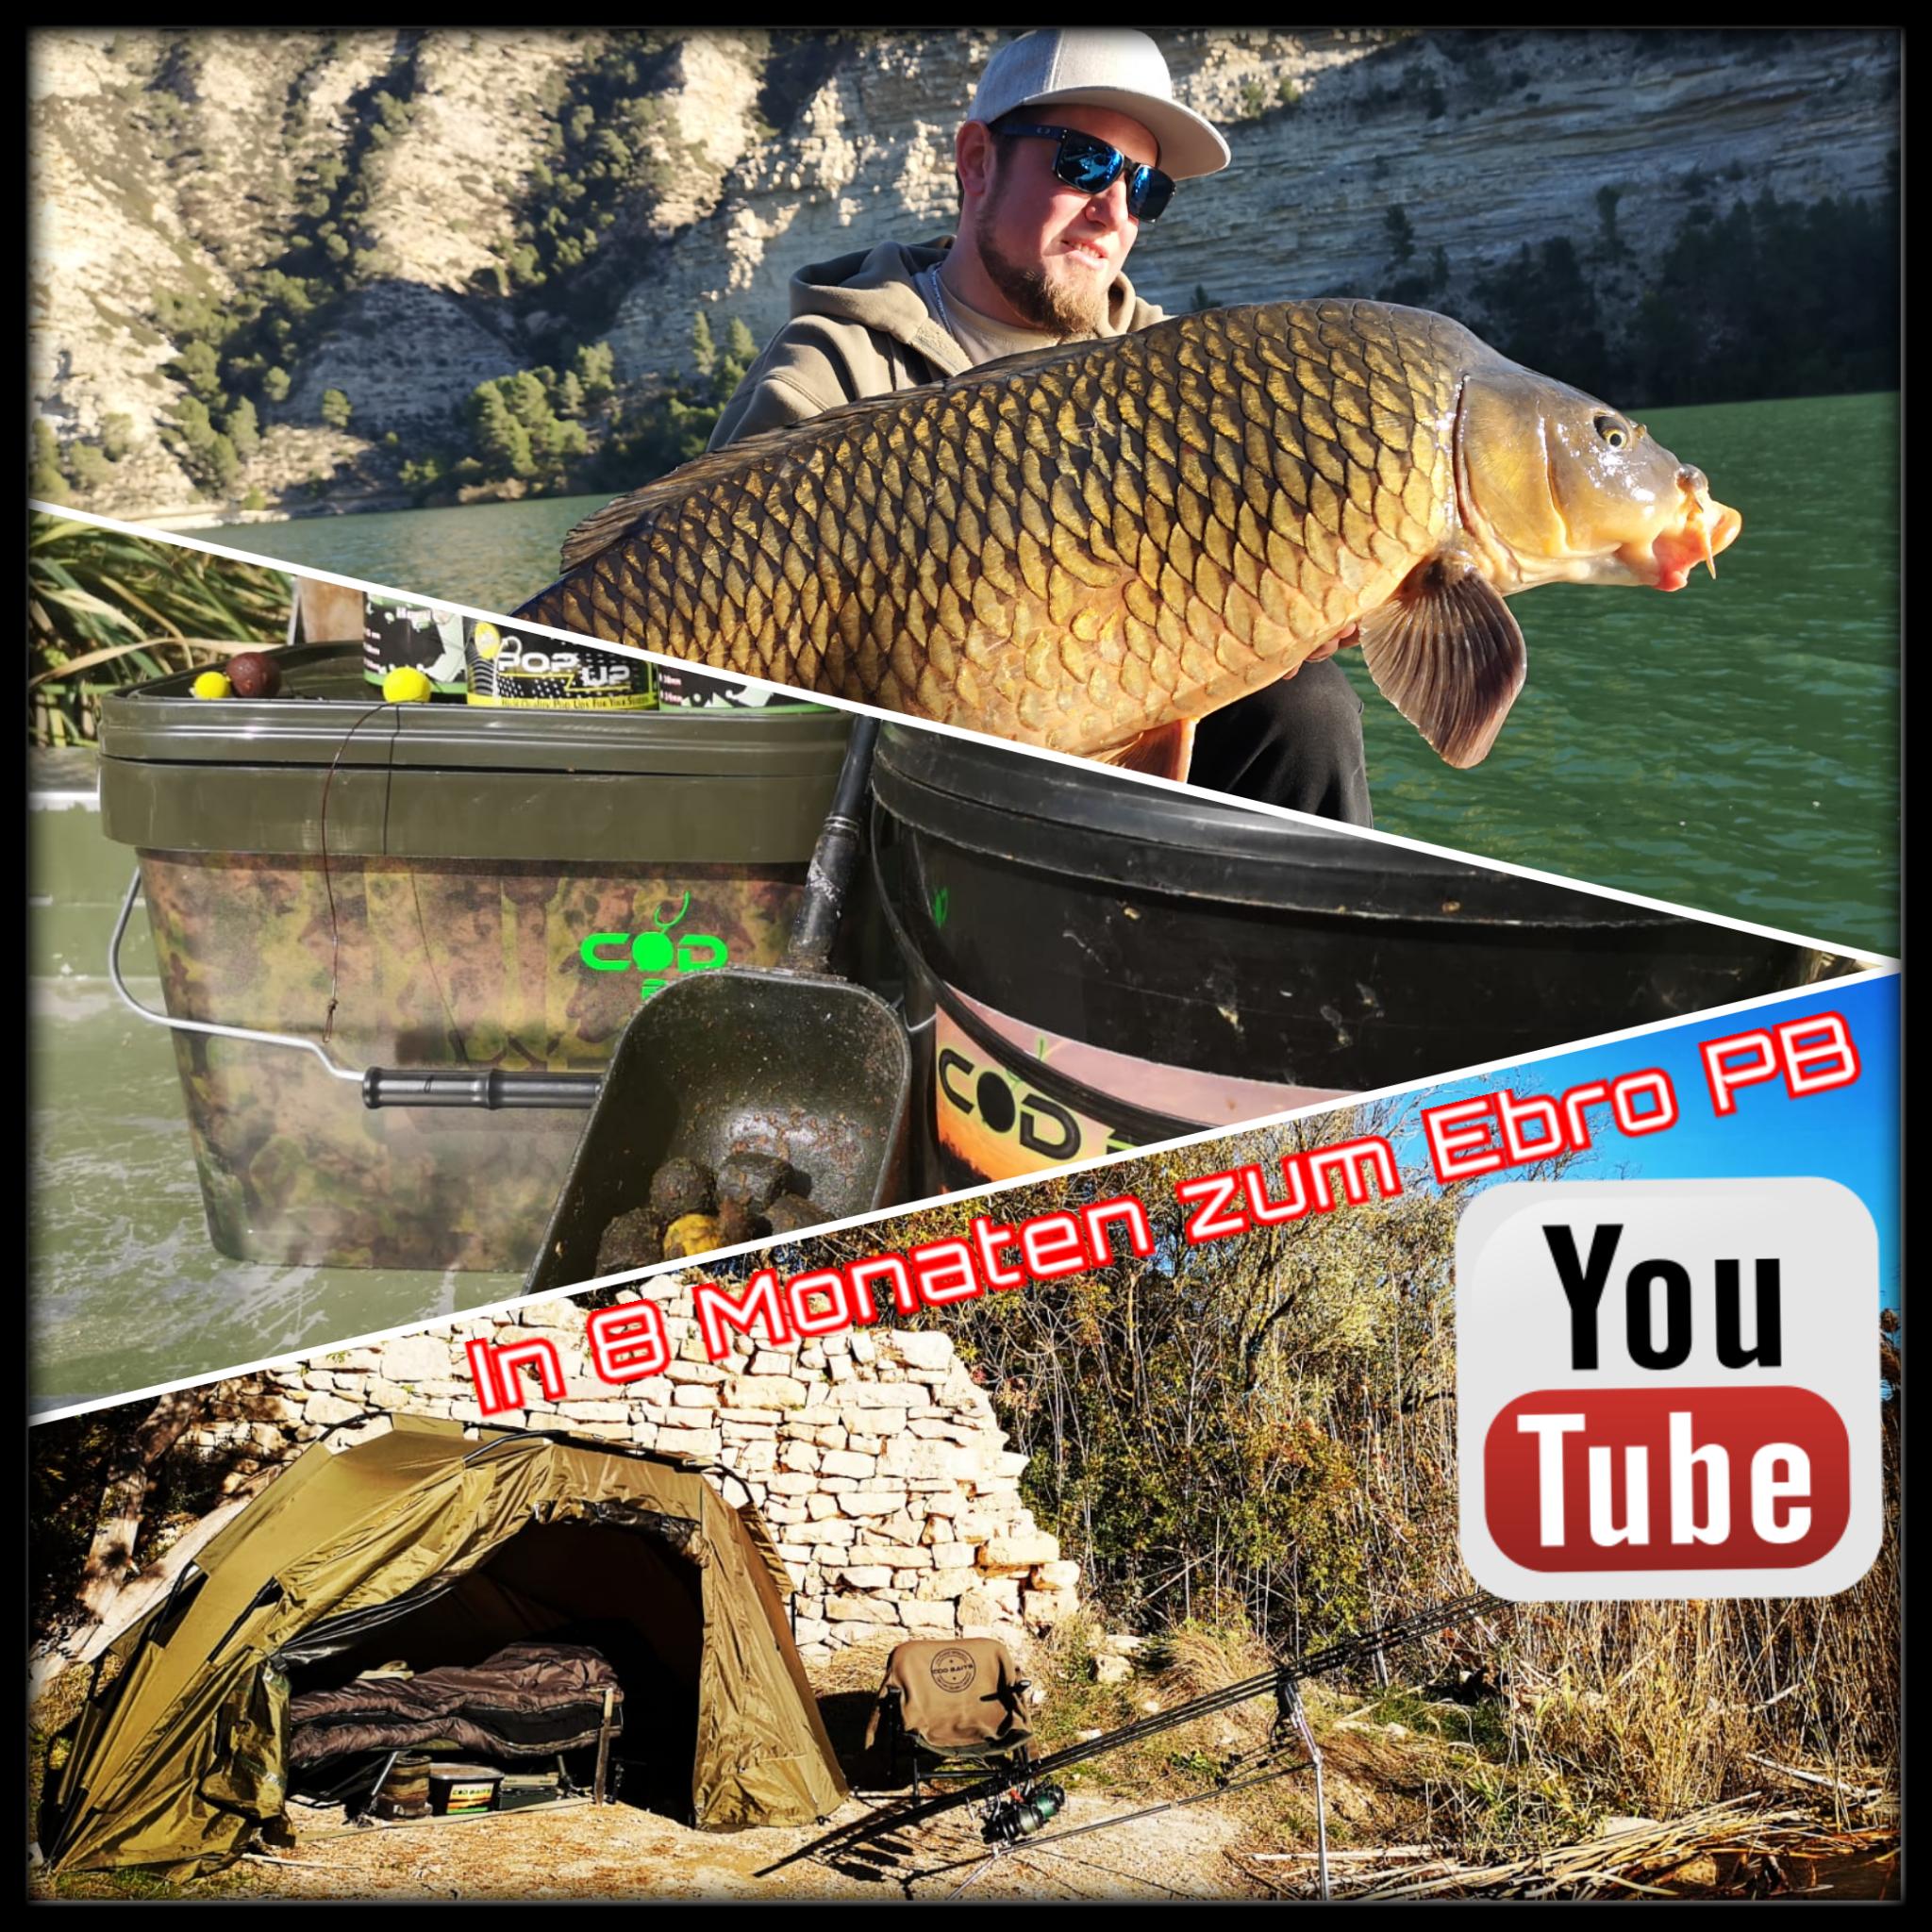 Jan Ebro Video